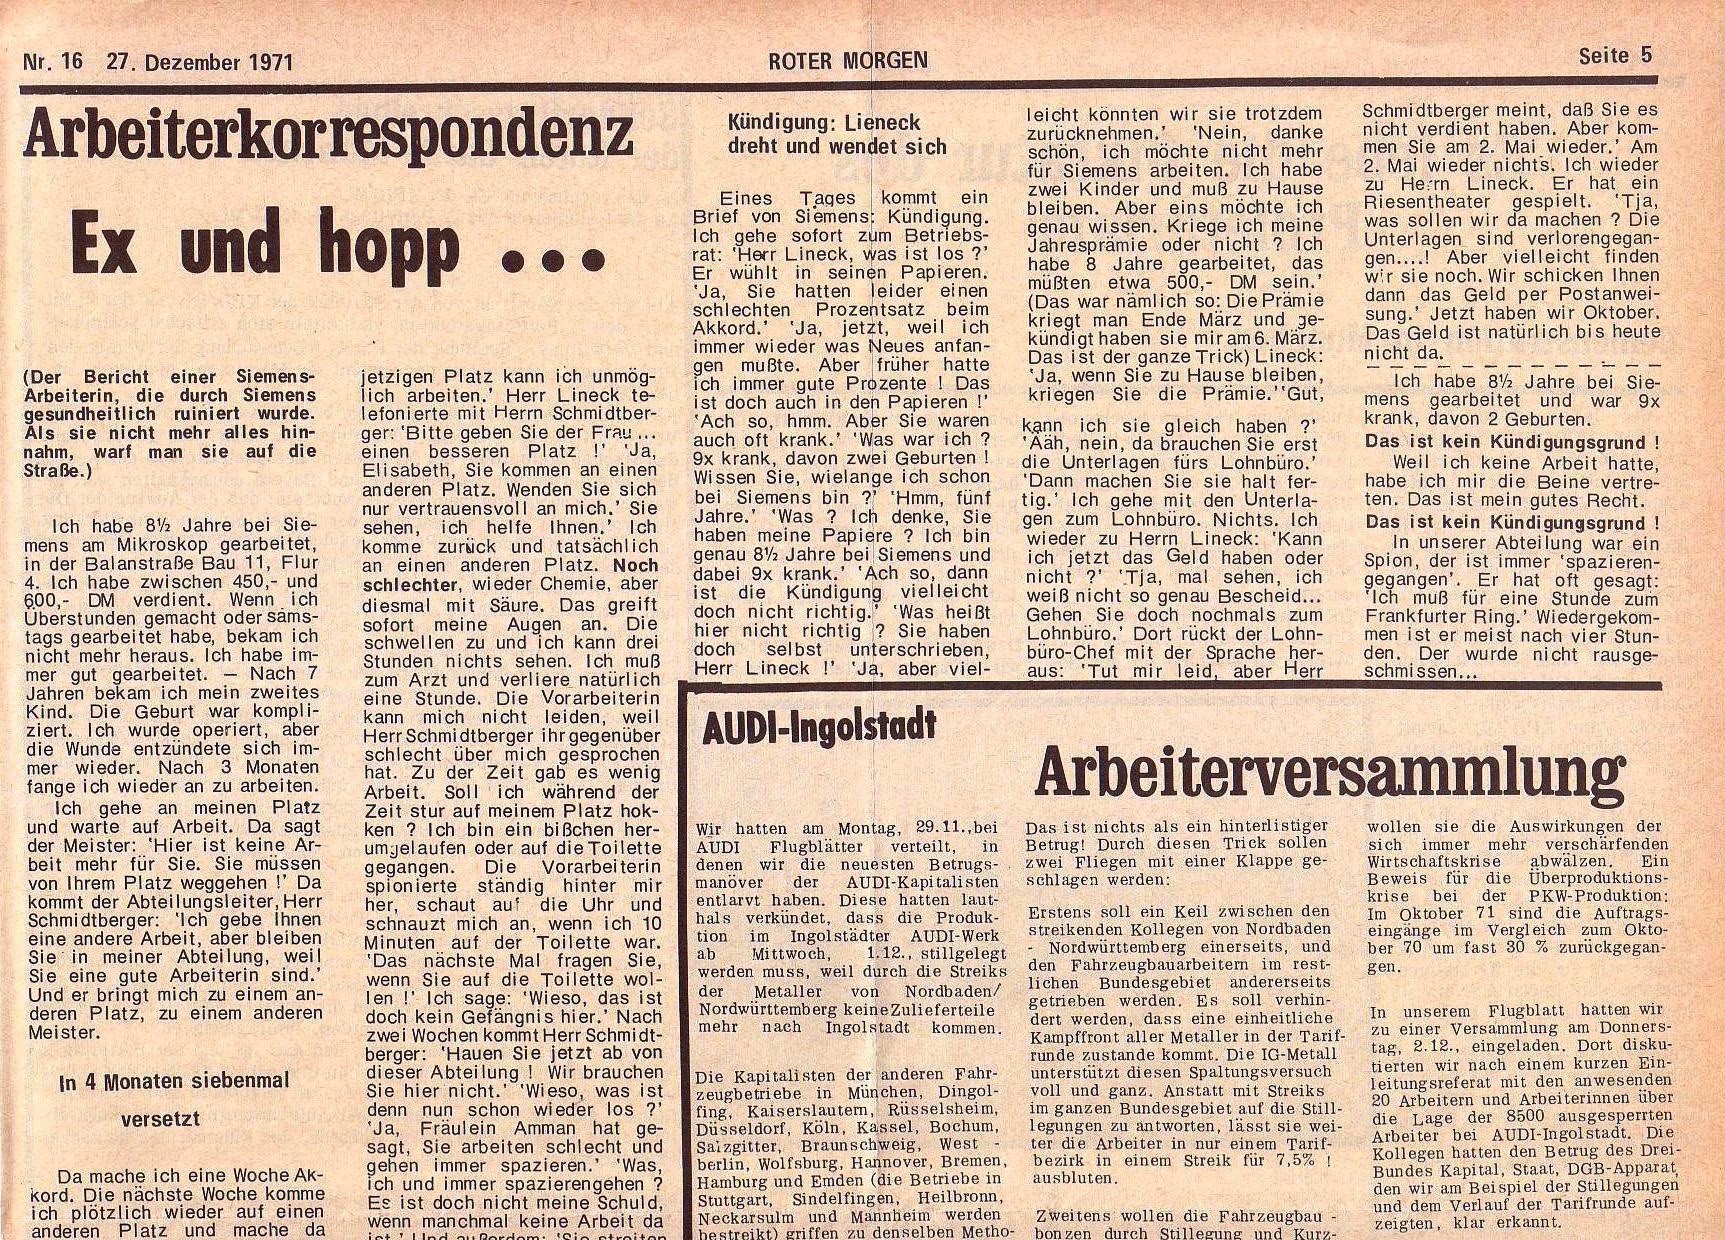 Roter Morgen, 5. Jg., 27. Dezember 1971, Nr. 16, Seite 5a